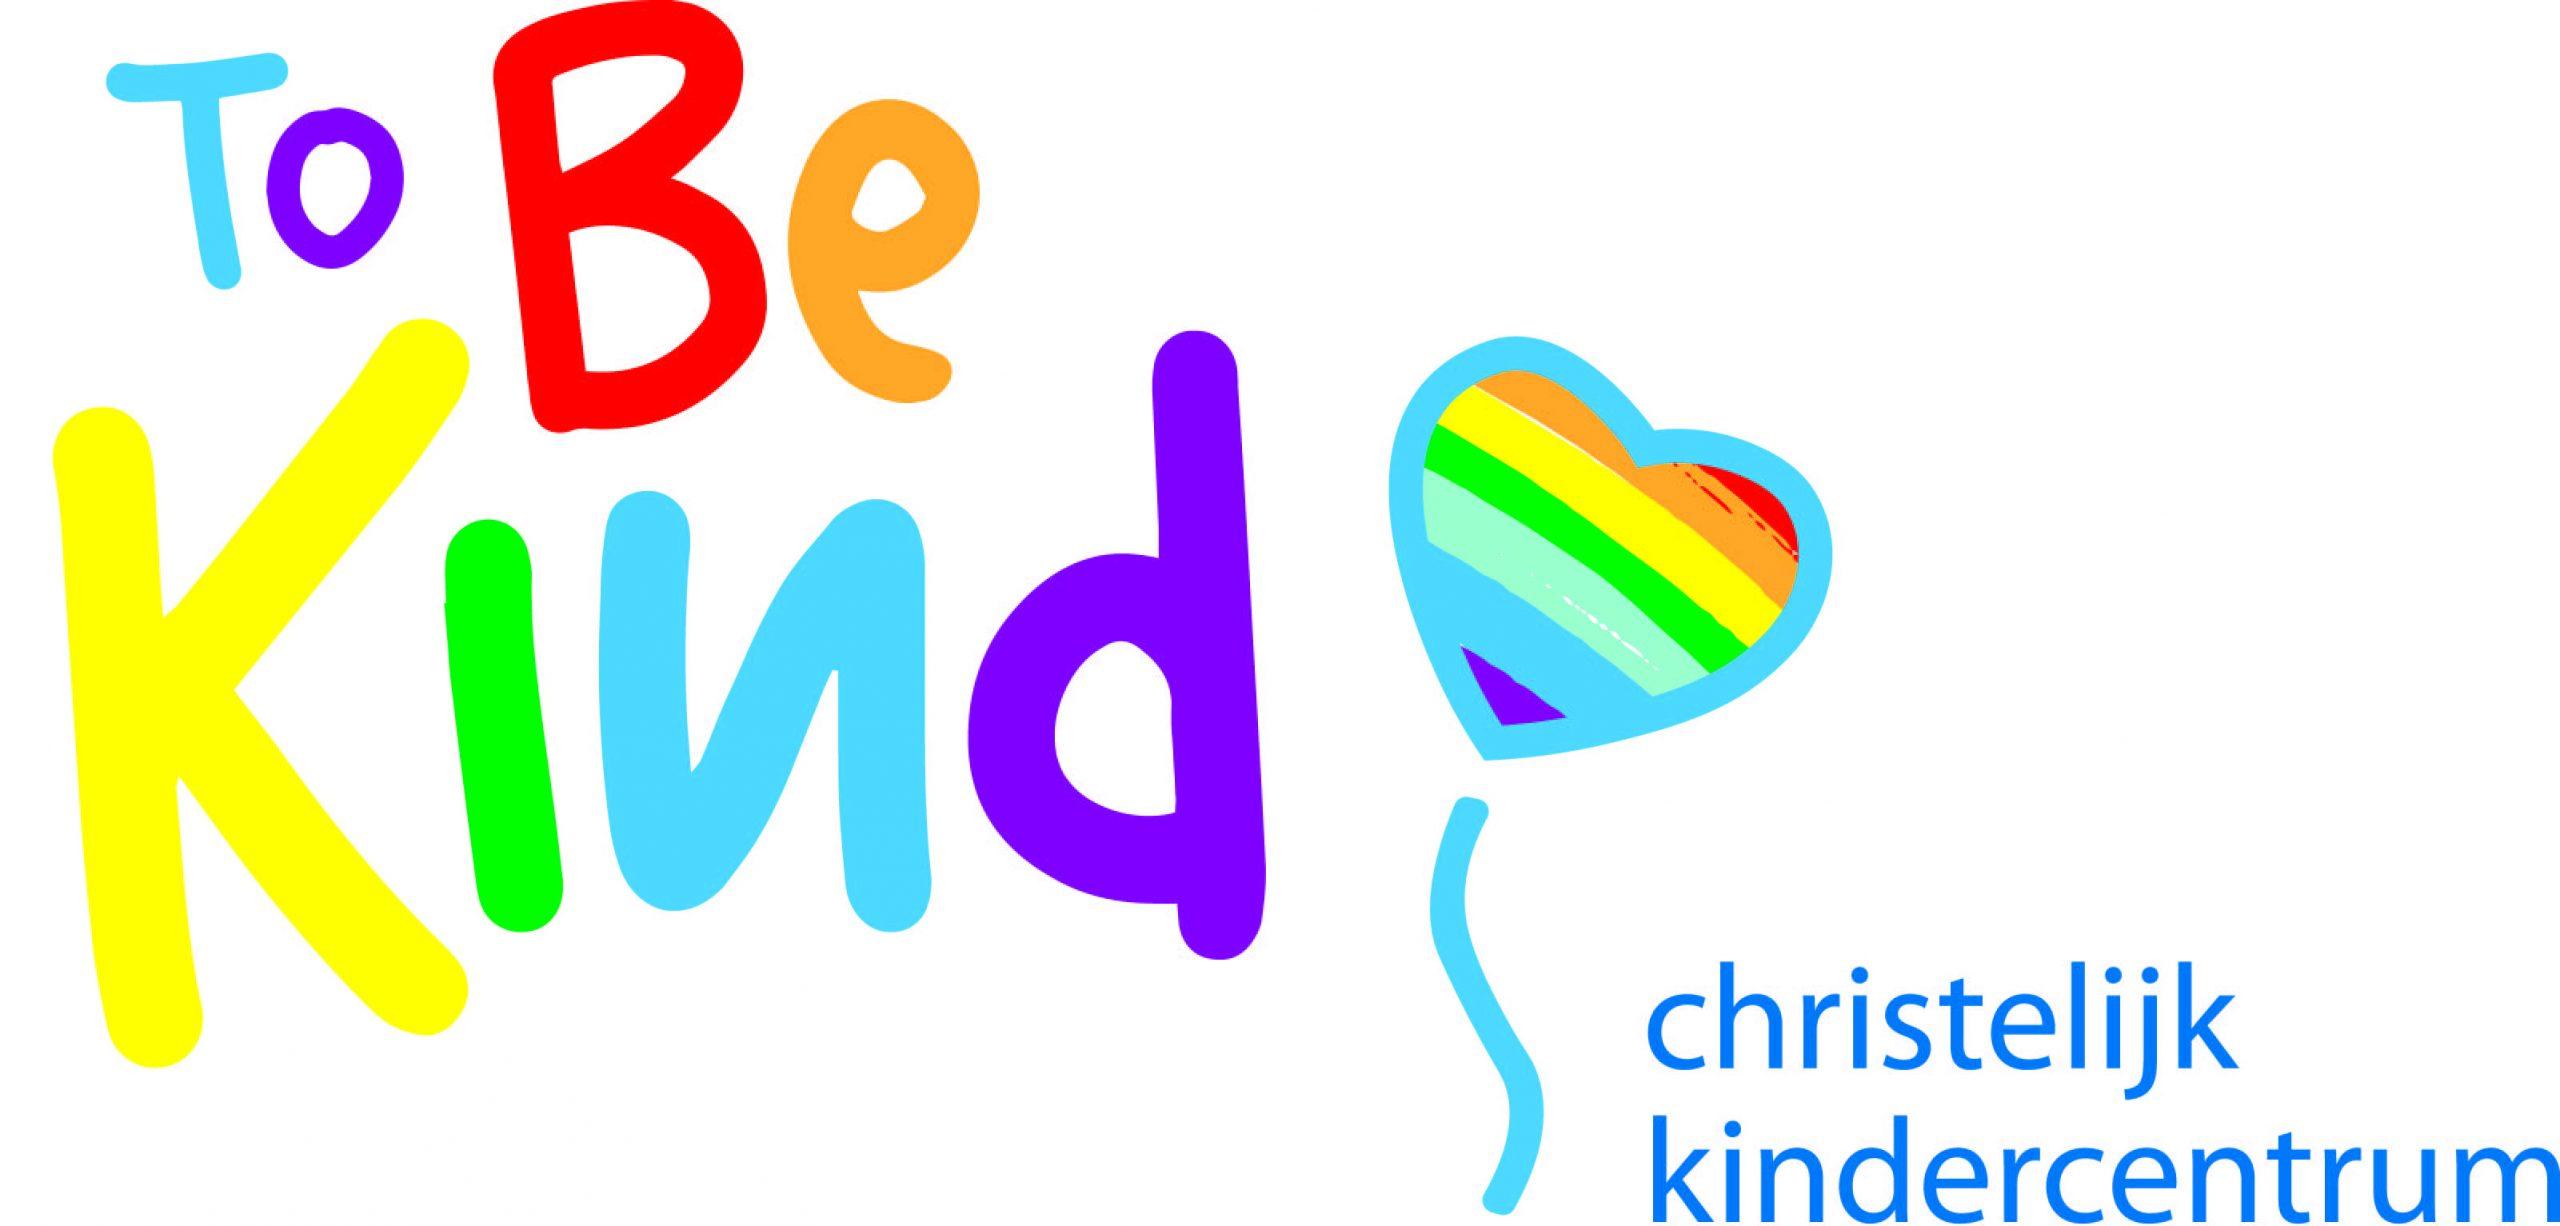 logo TBK definitief 1 1 scaled